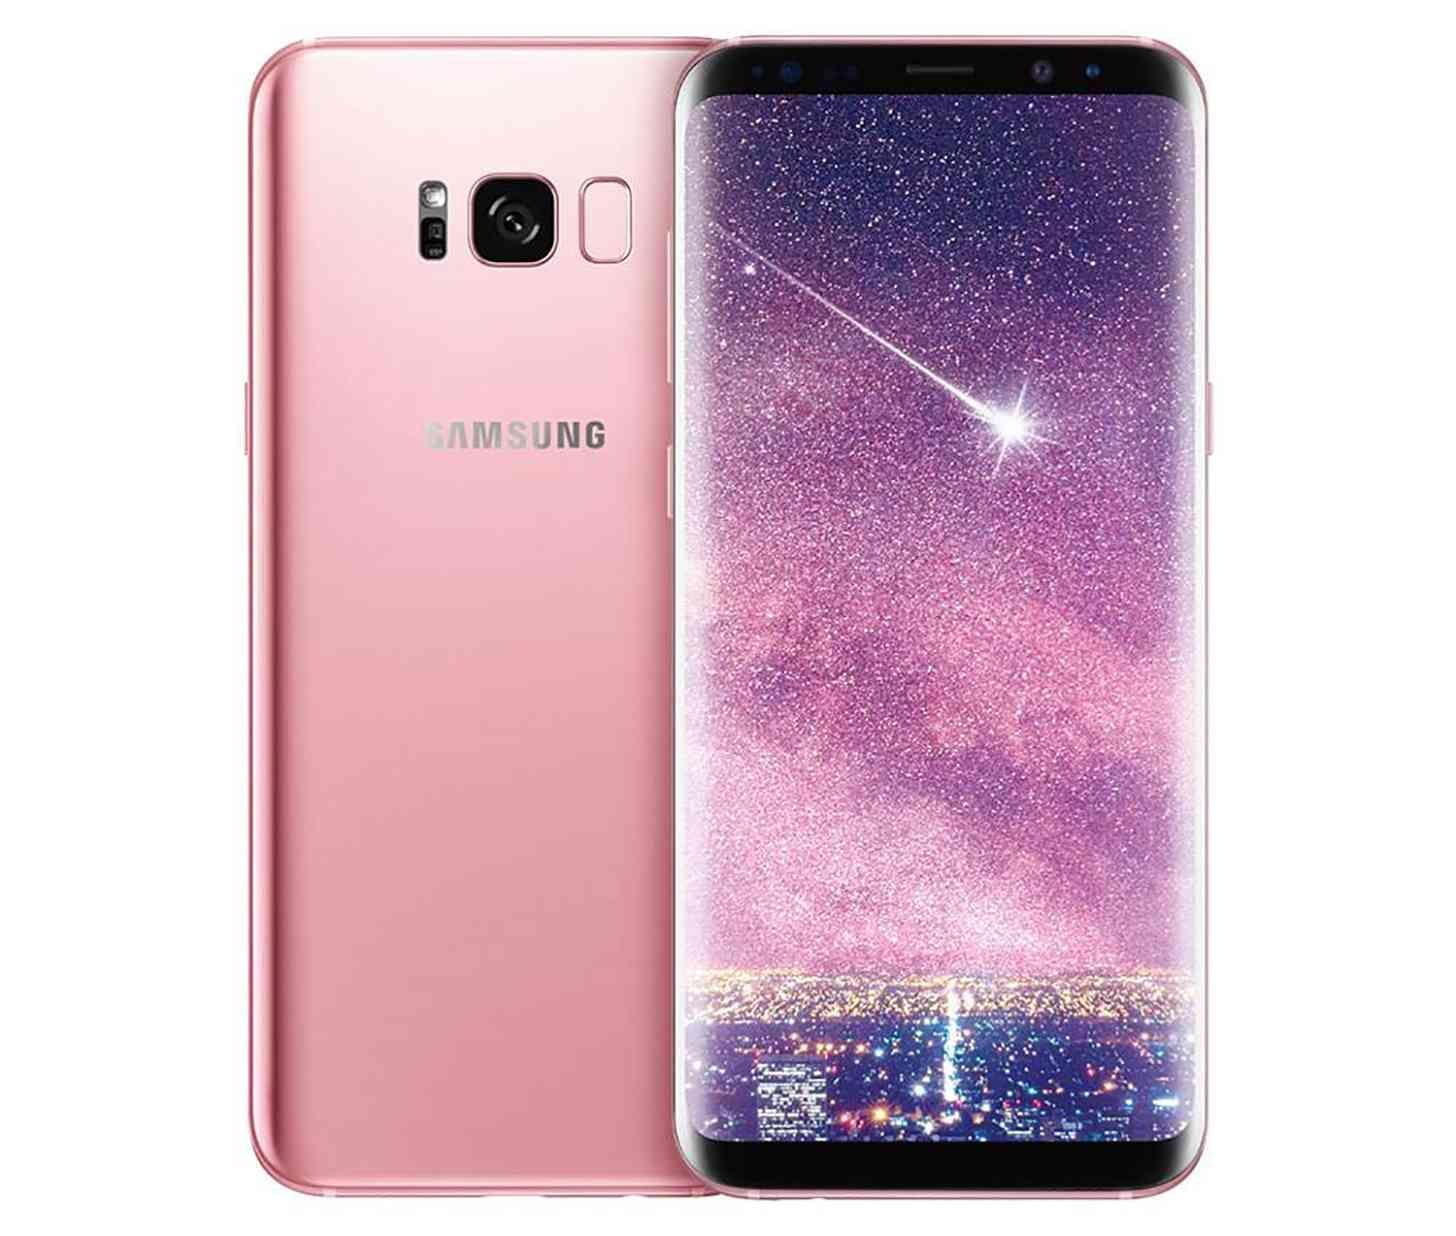 Samsung Galaxy S8 Gets New Rose Gold Color Option Telefonos